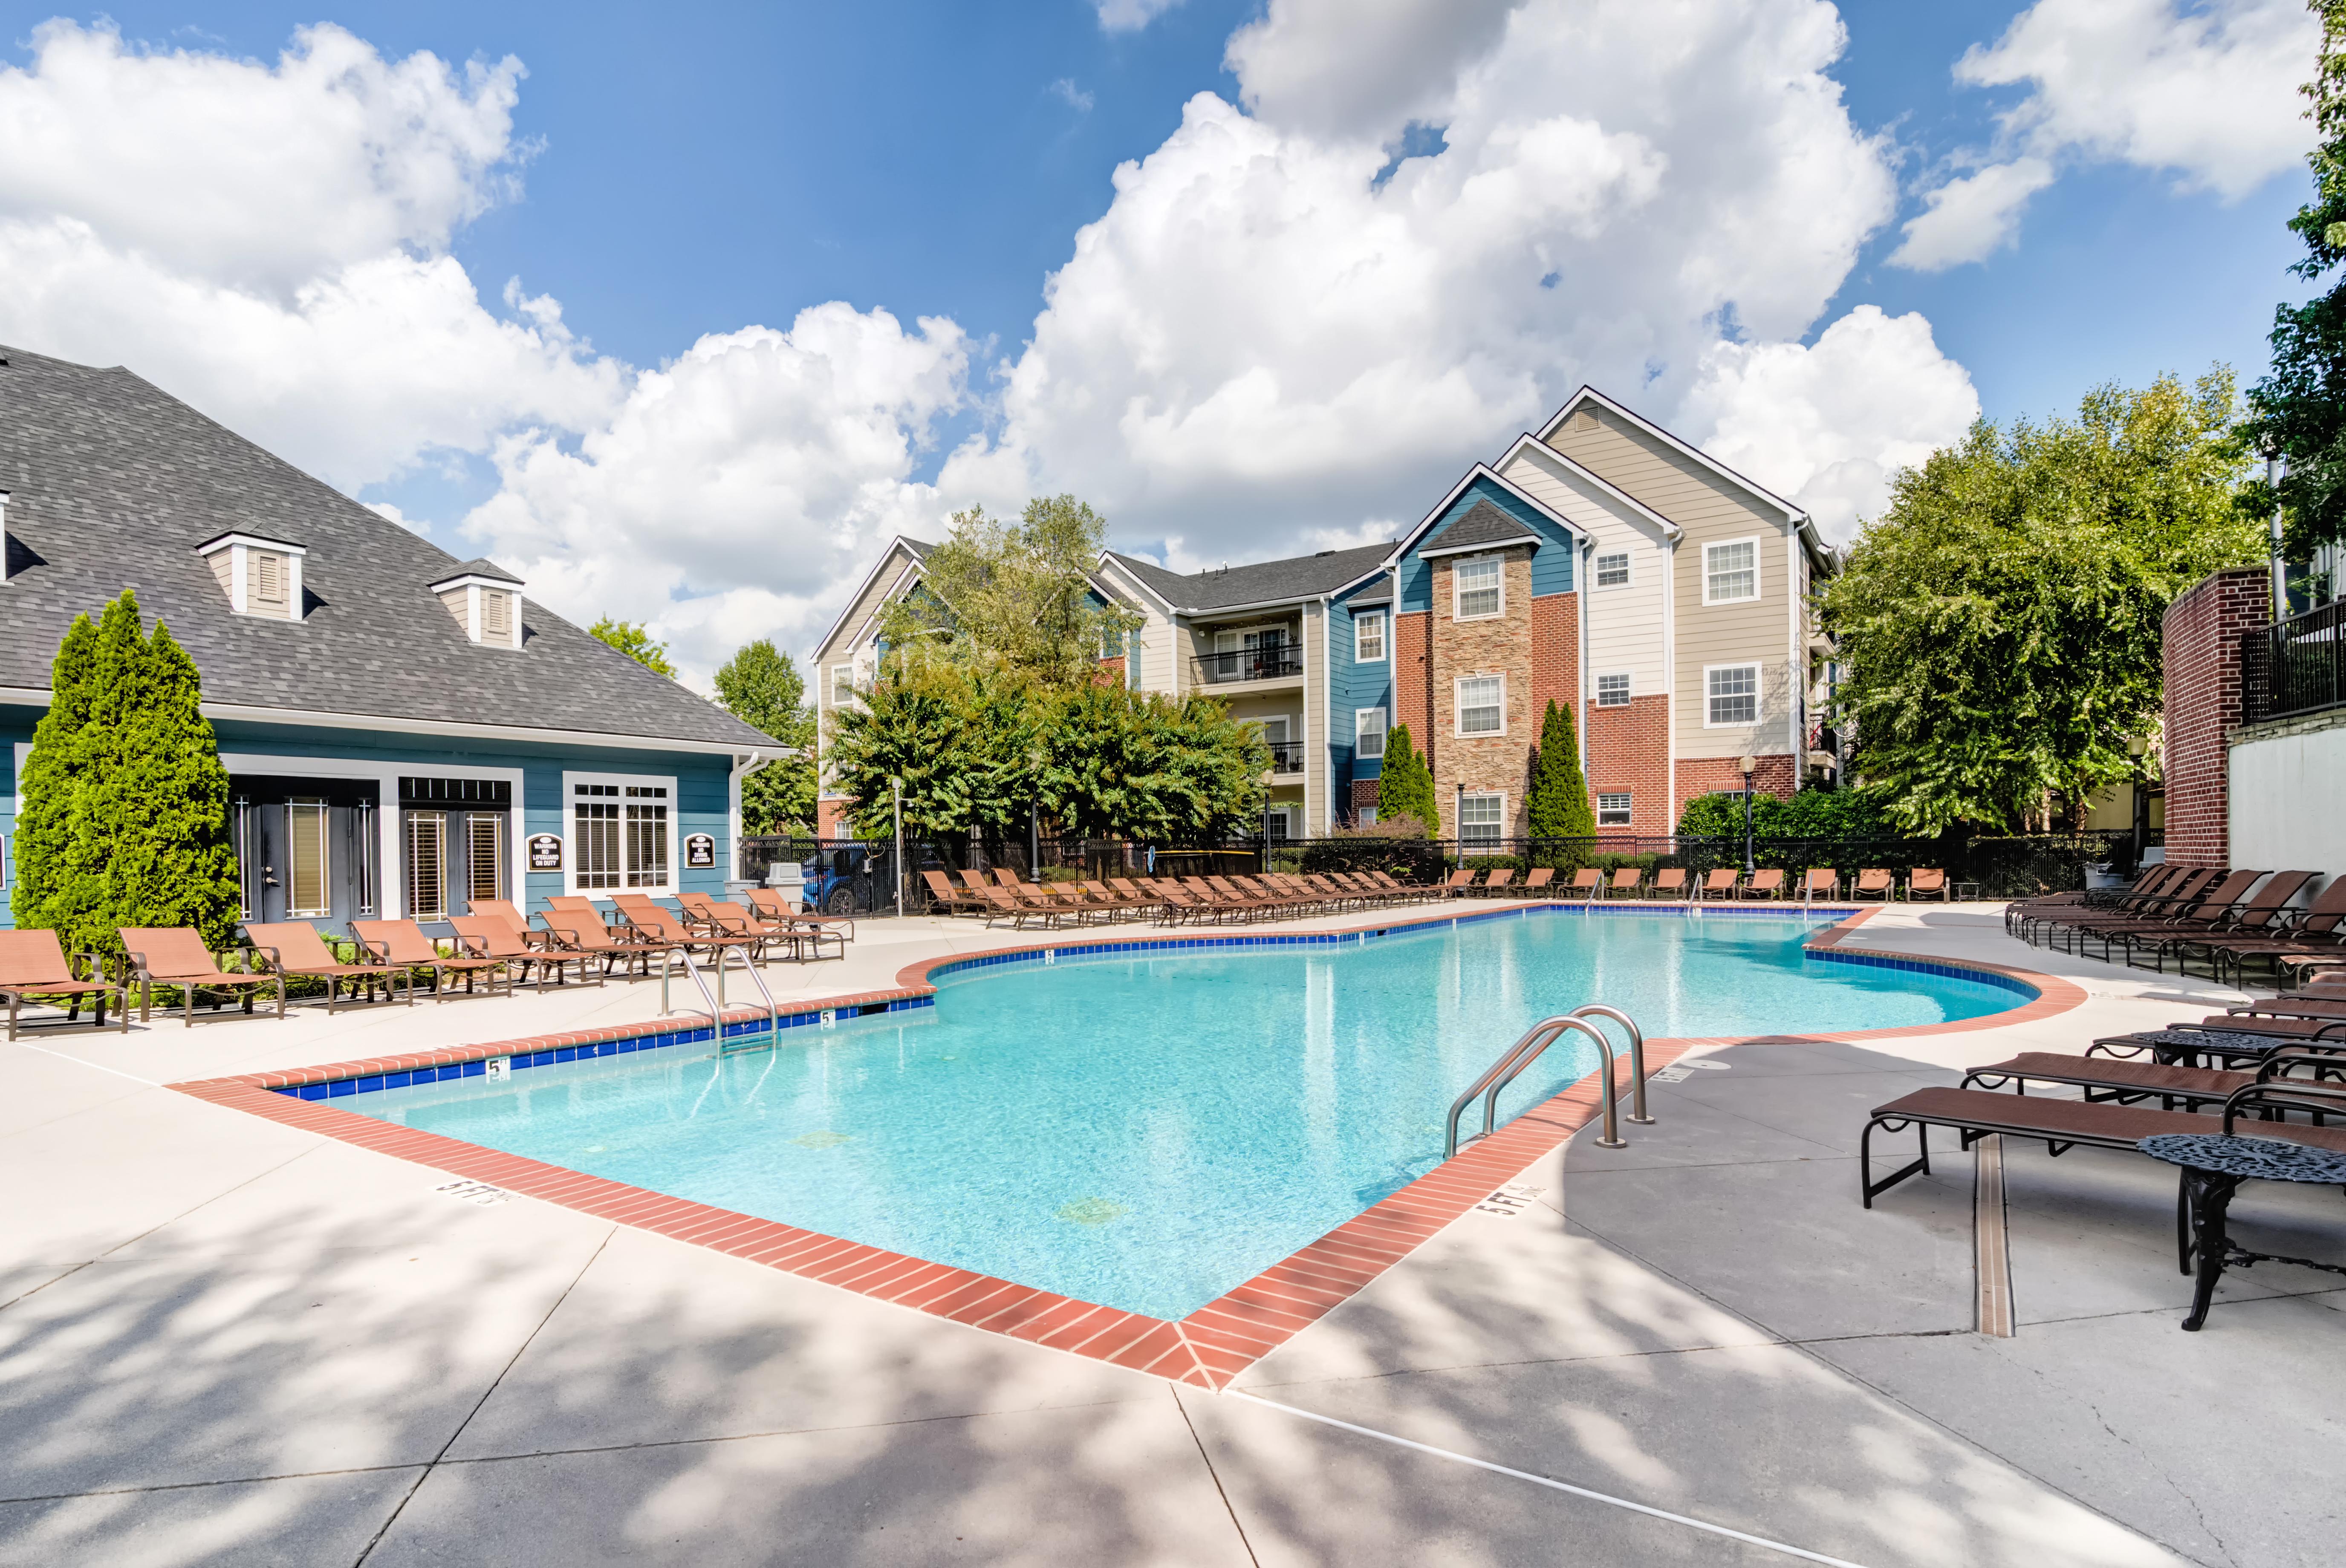 Society 865 reviews | Apartments at 2240 Grand Ave - Knoxville TN